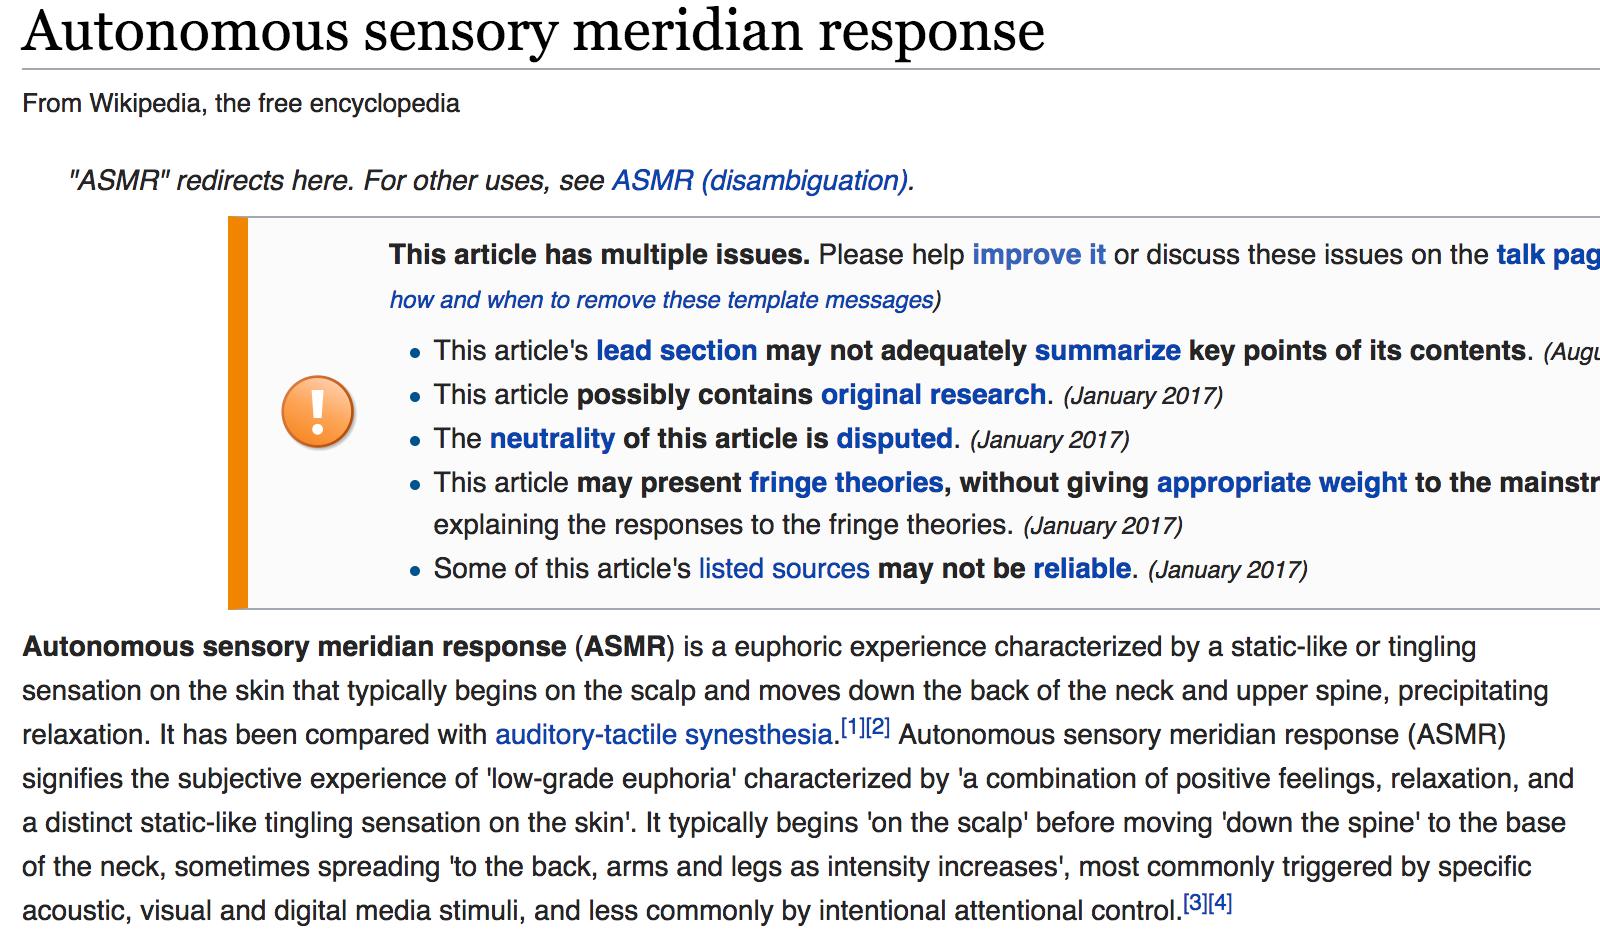 an explanation of the tingling sensation or autonomous sensory meridian response asmr